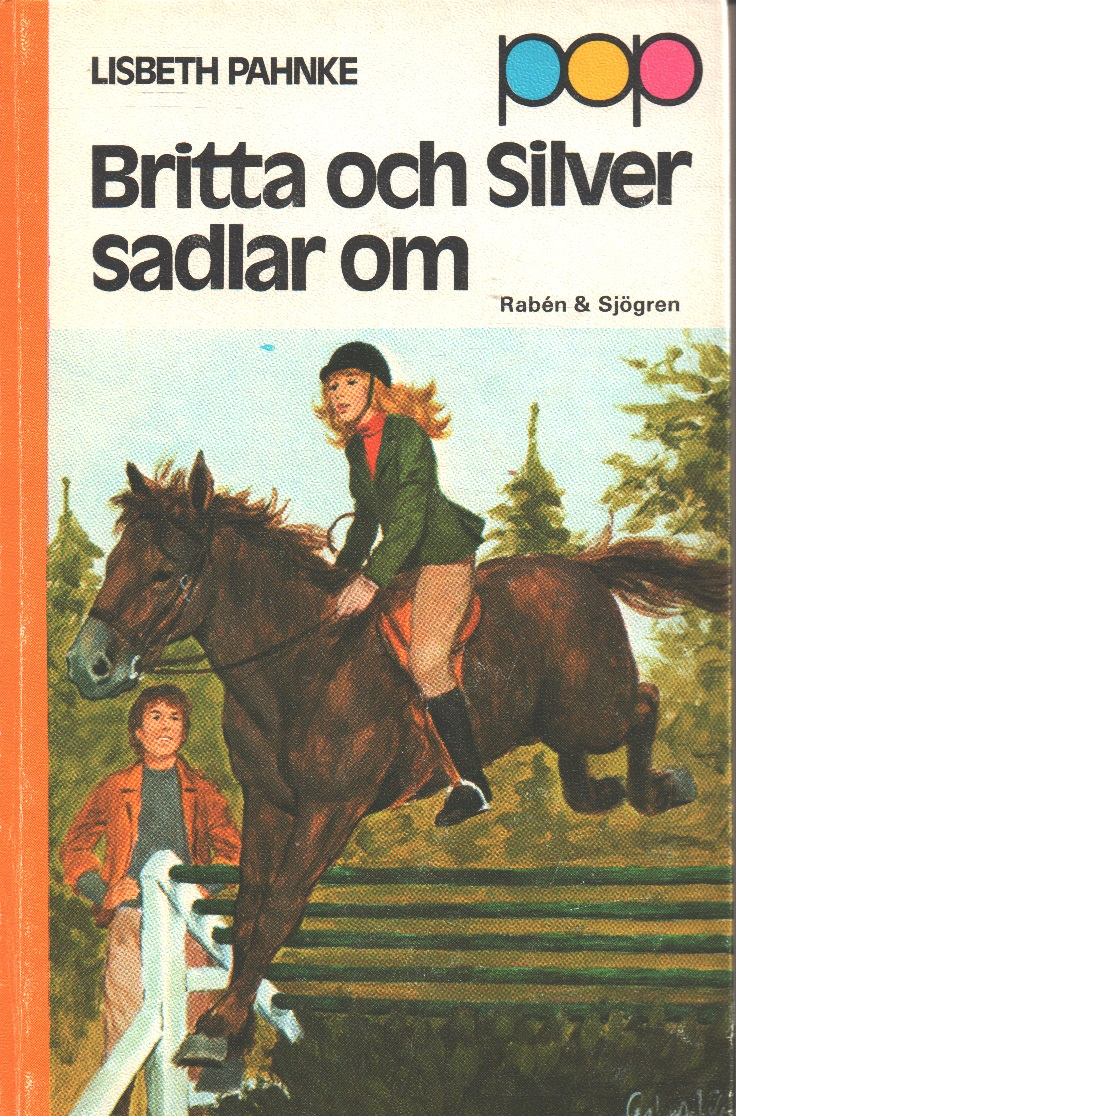 Britta och Silver sadlar om - Pahnke, Lisbeth